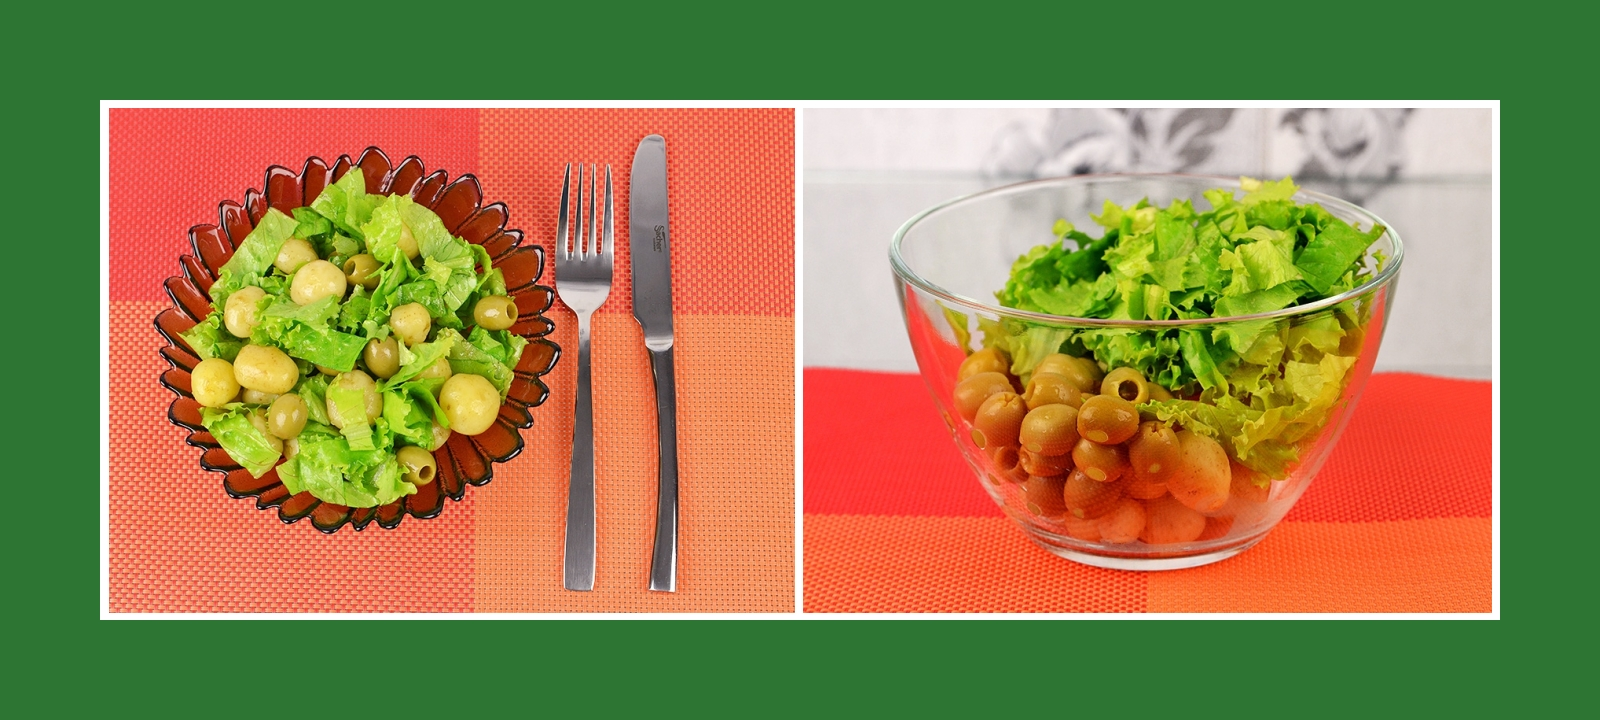 Kartoffelsalat aus Frühkartoffeln, Salat, Oliven